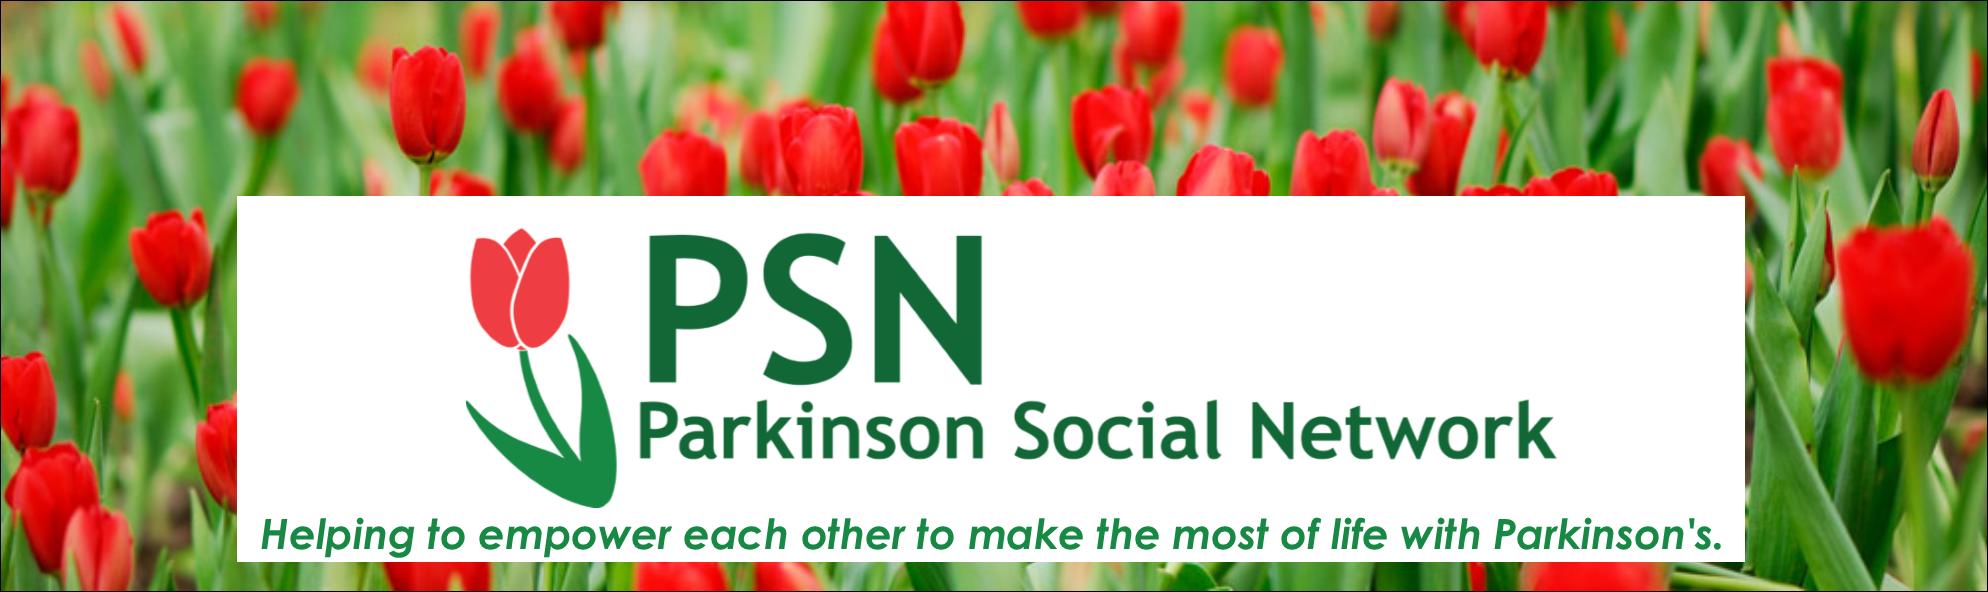 Parkinson Social Network